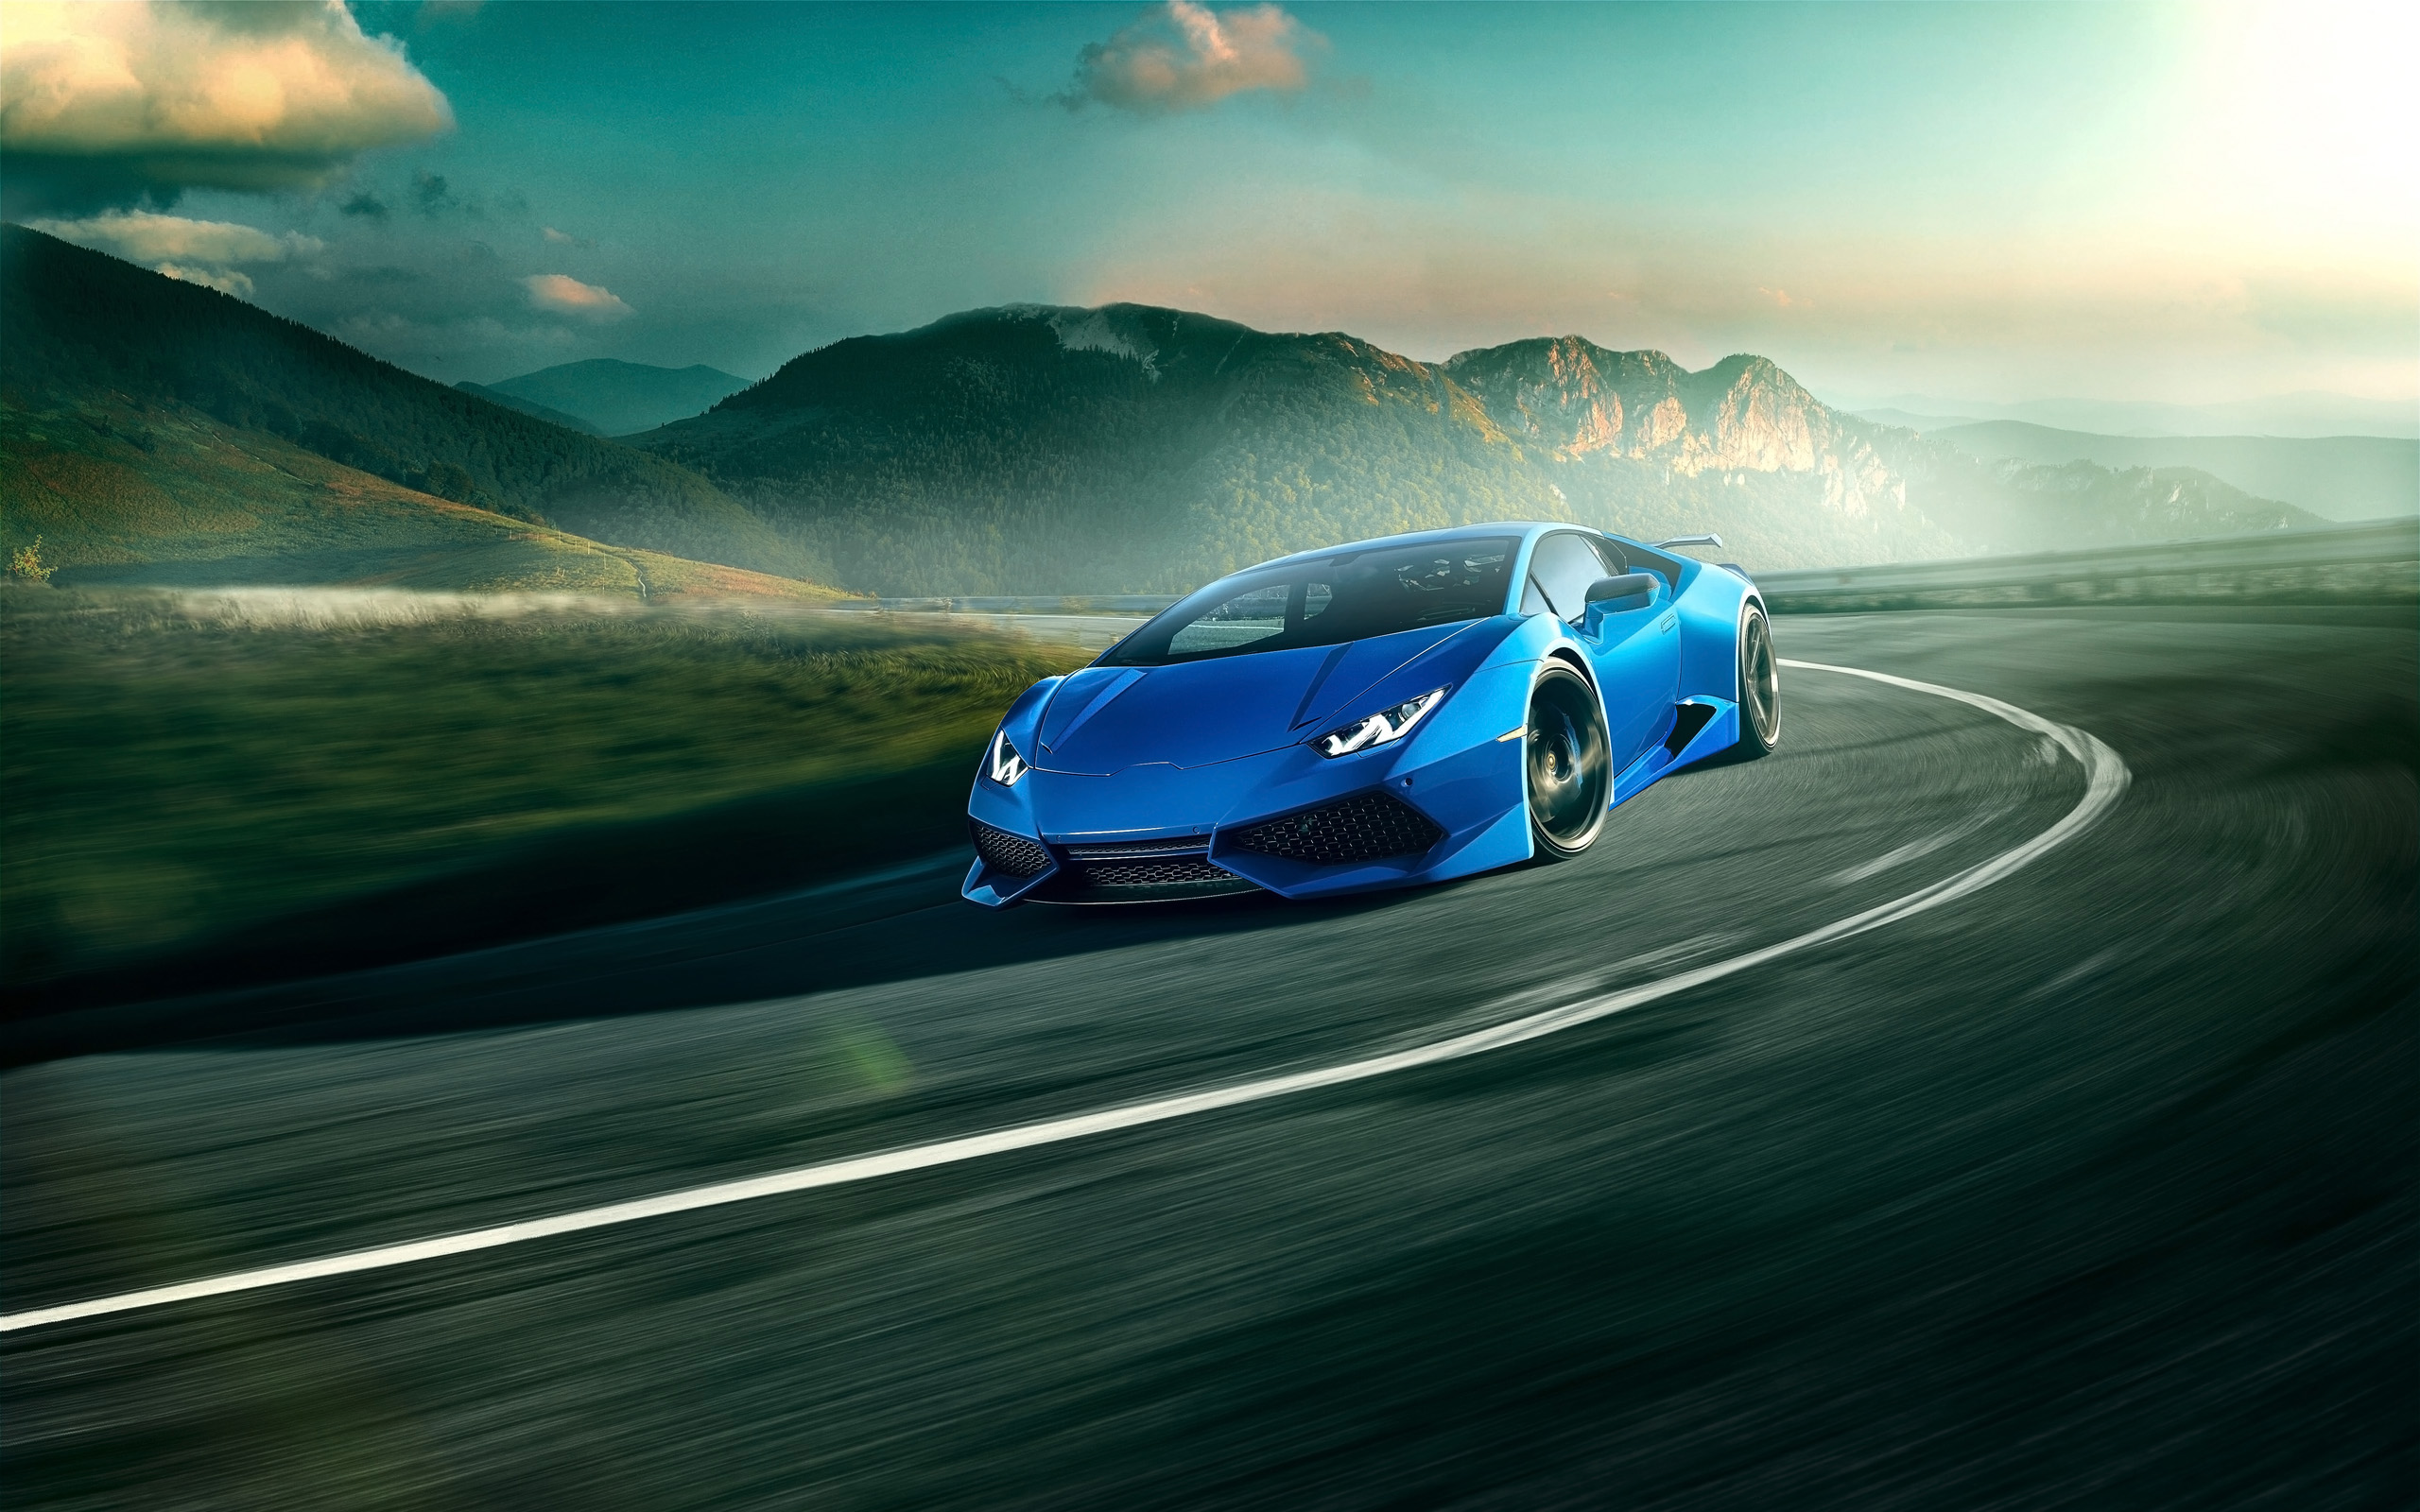 Novitec Torado Lamborghini Huracan N Largo Hd Wallpaper